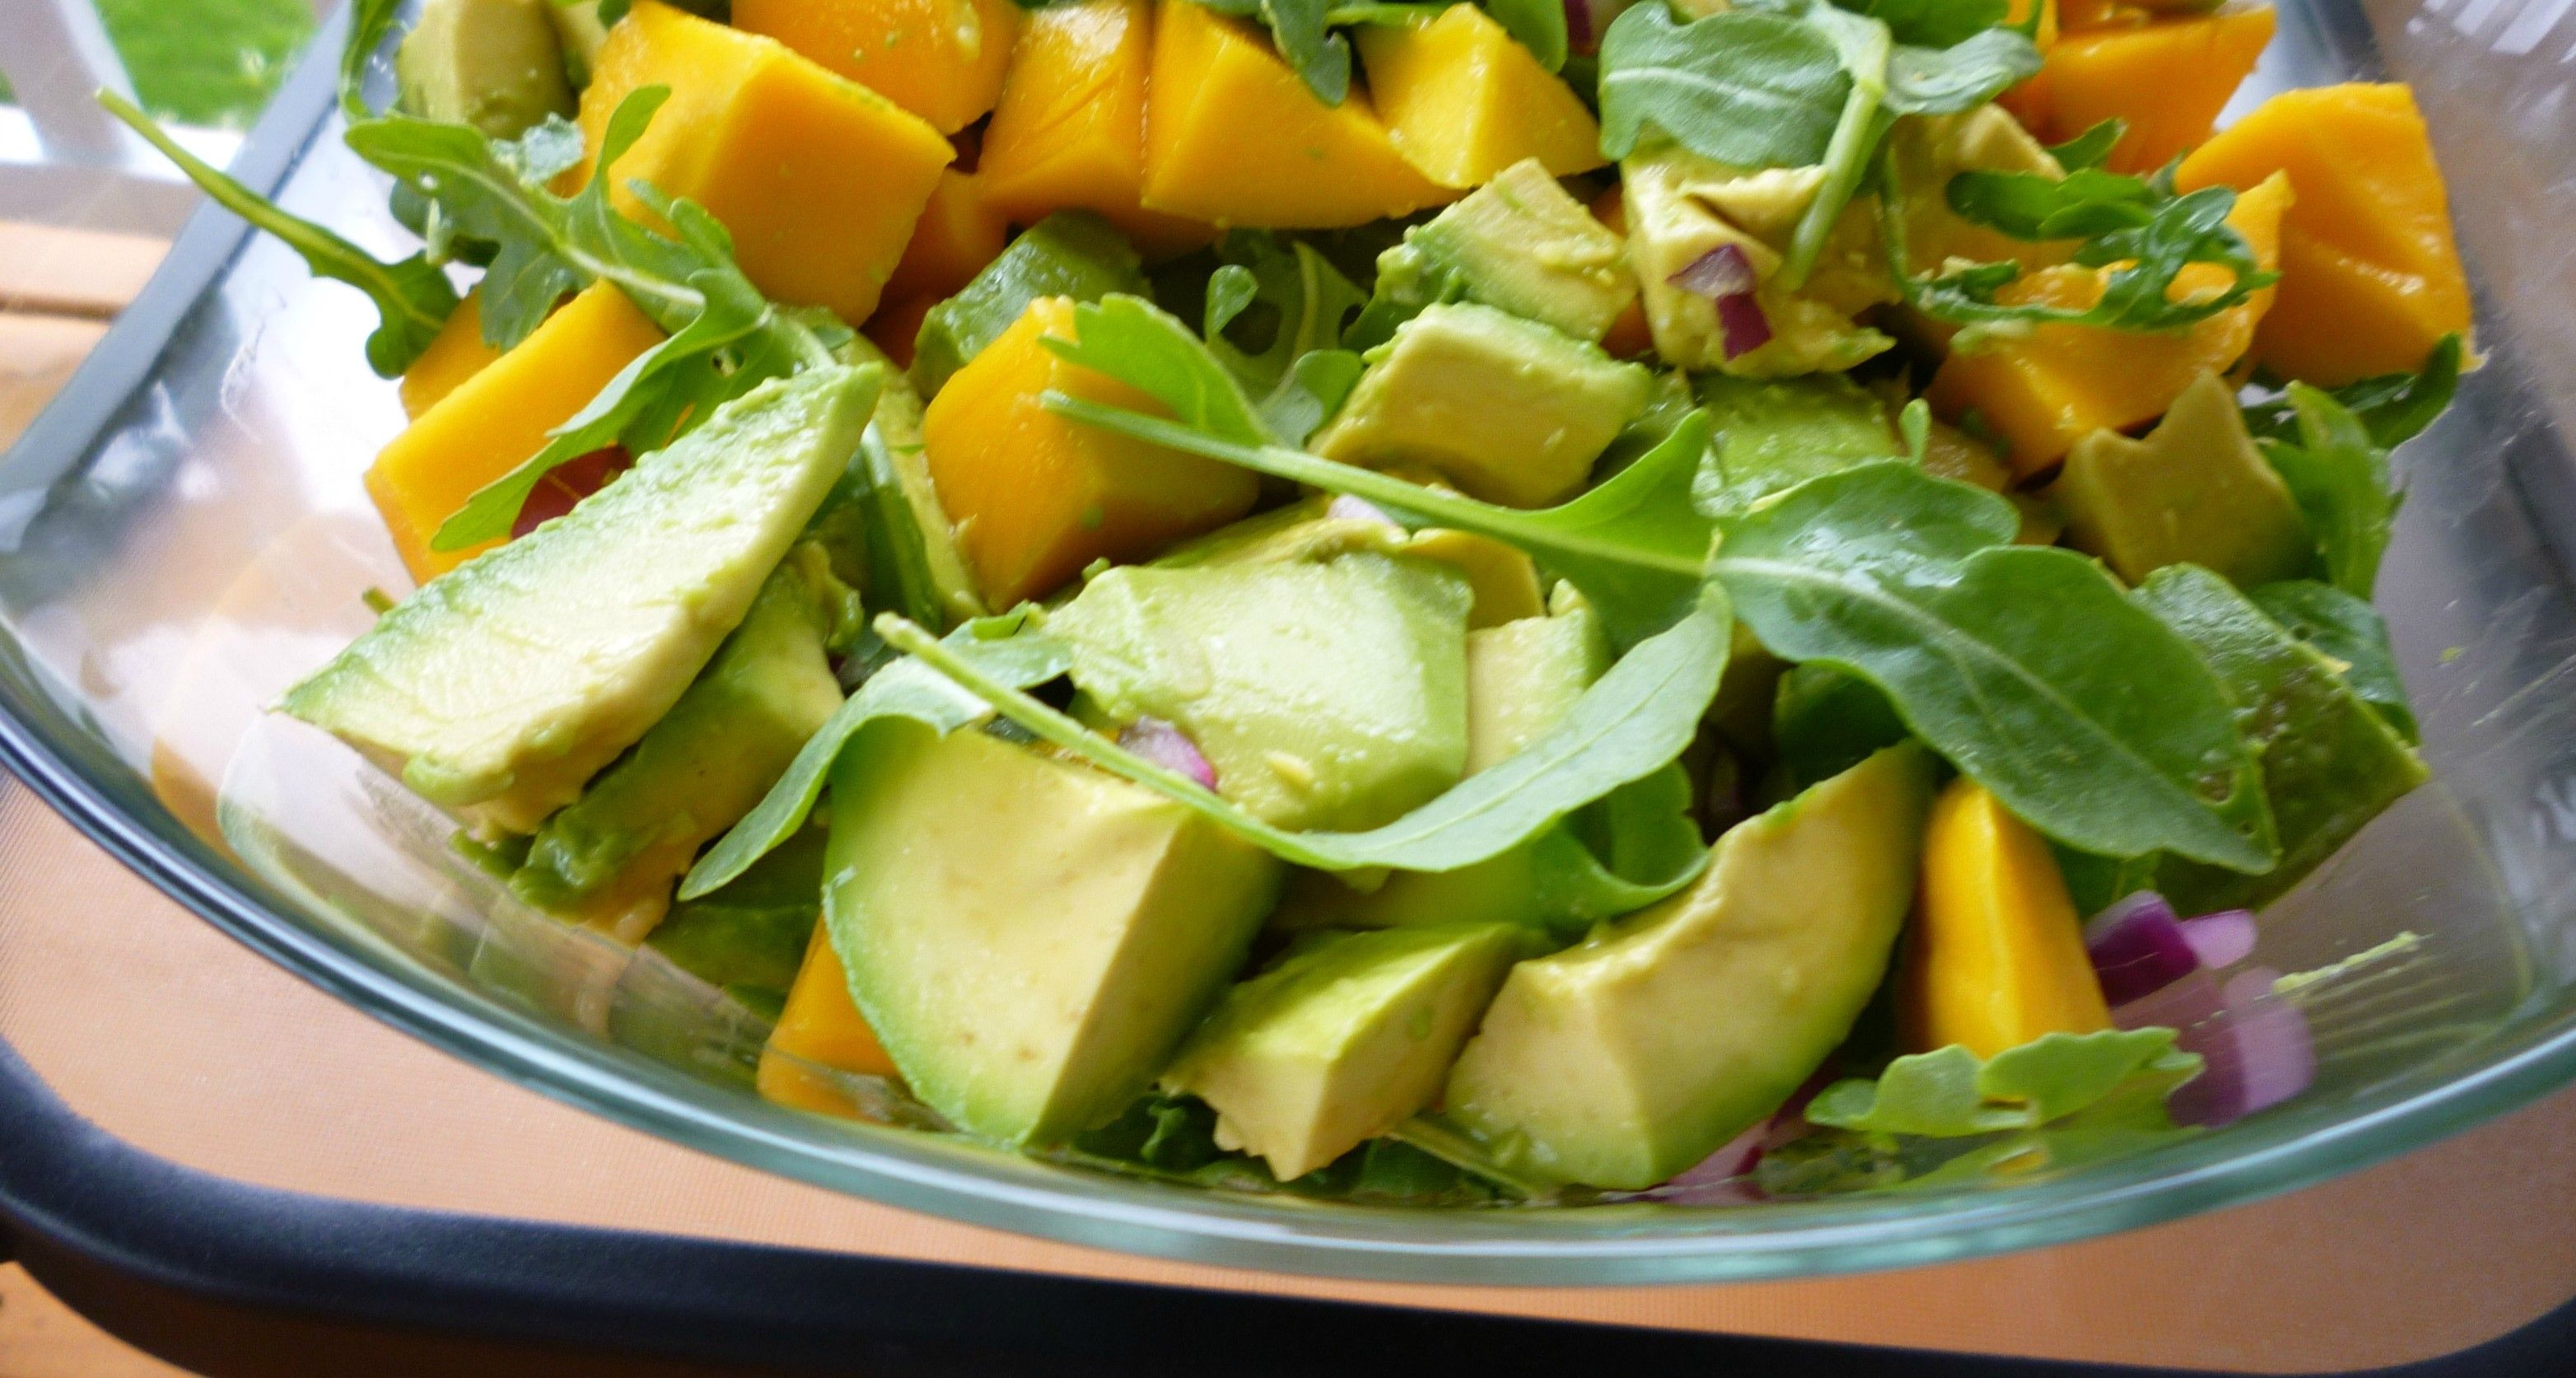 Mango and Arugula Salad with Cilantro Crema